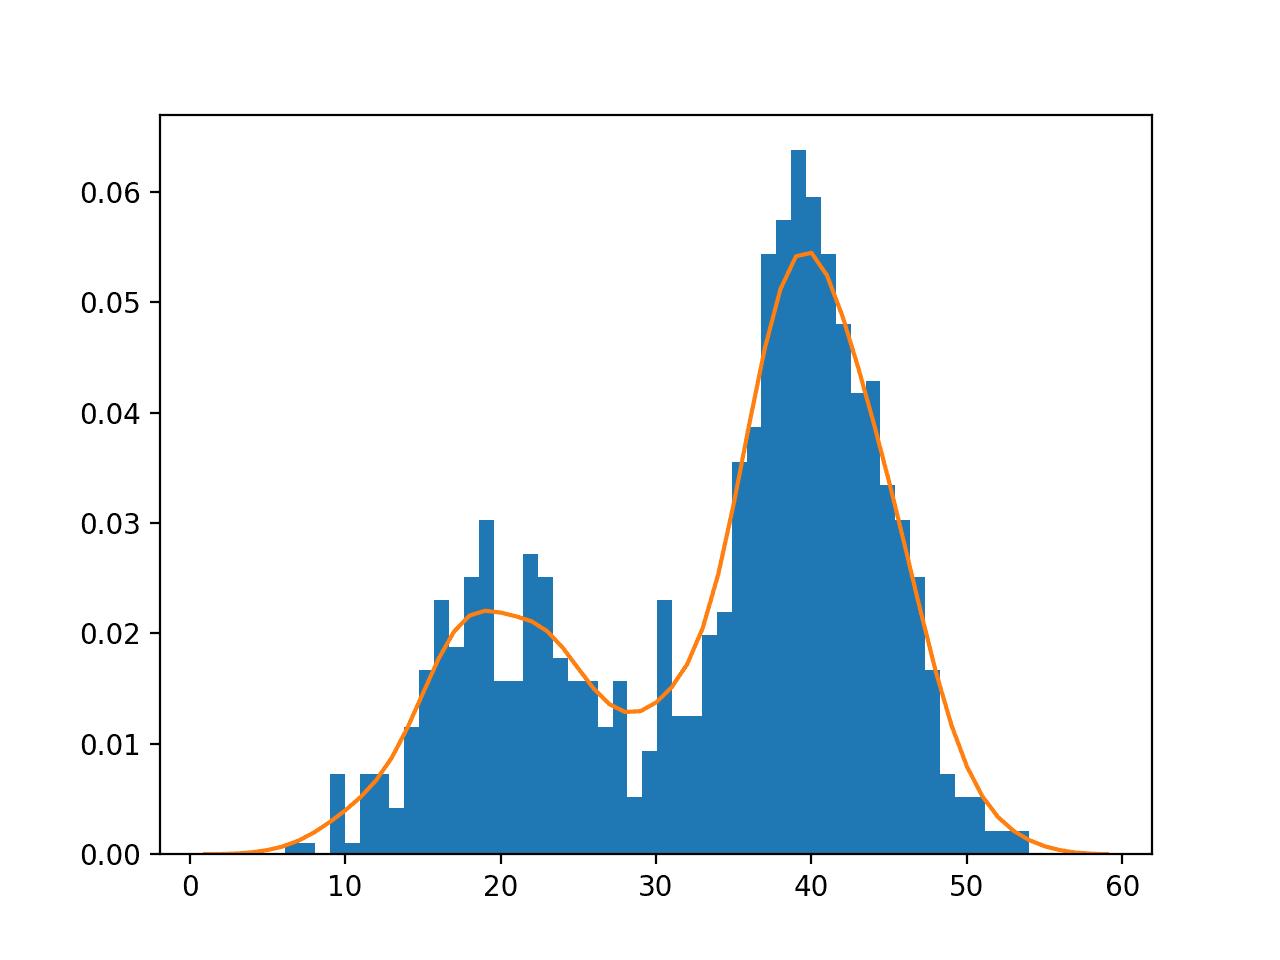 Histogram and Probability Density Function Plot Estimated via Kernel Density Estimation for a Bimodal Data Sample